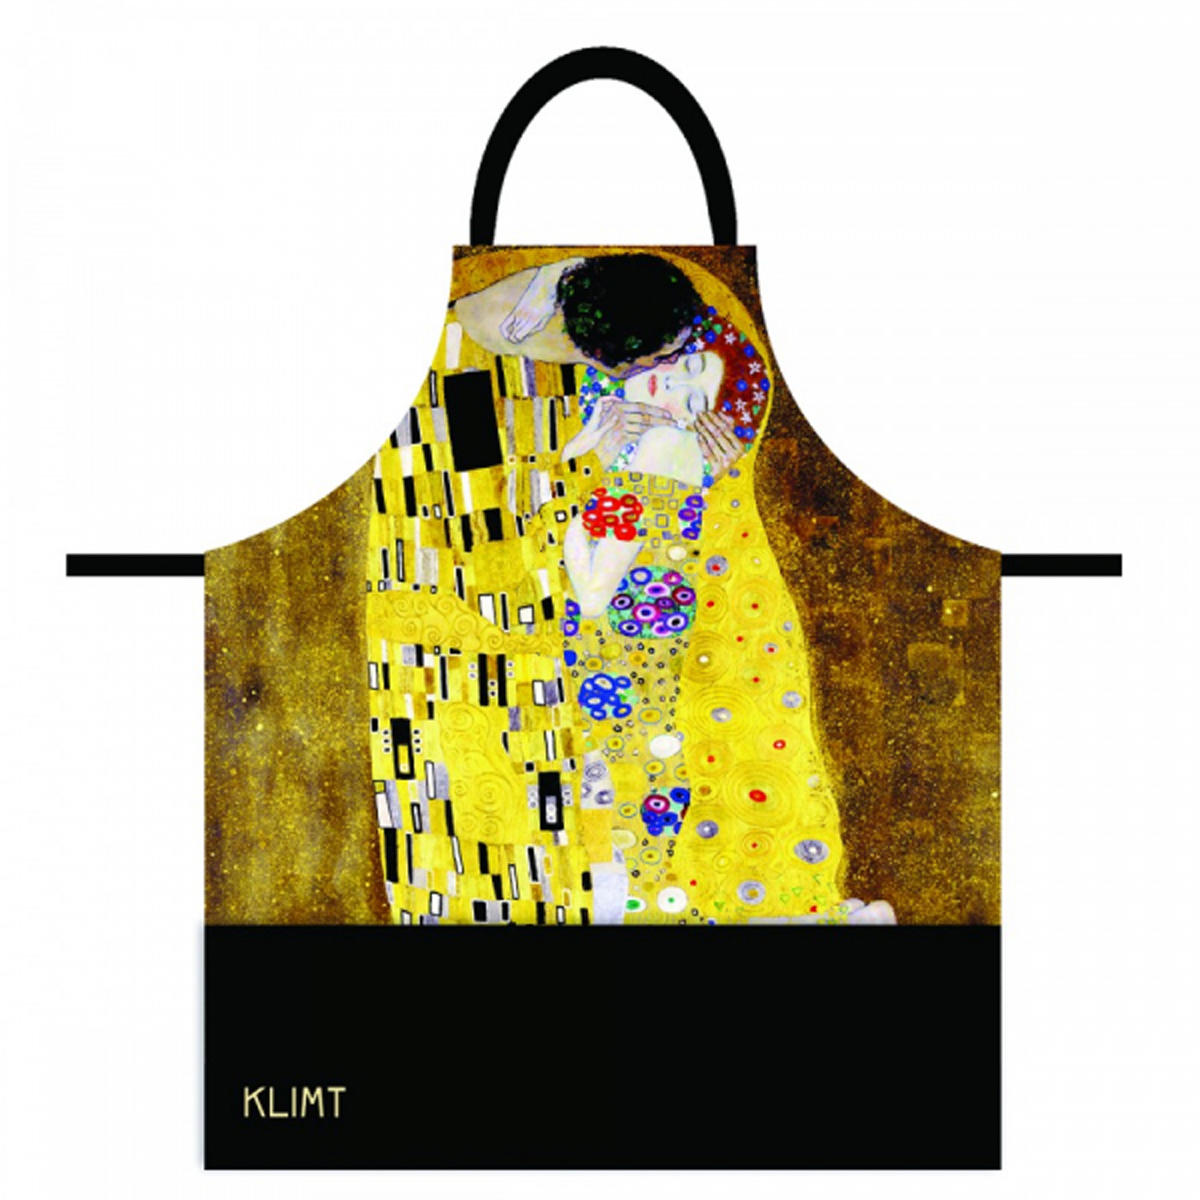 Tablier coton \'Gustav Klimt\' (Le Baiser) - 78x68 cm - [R2002]